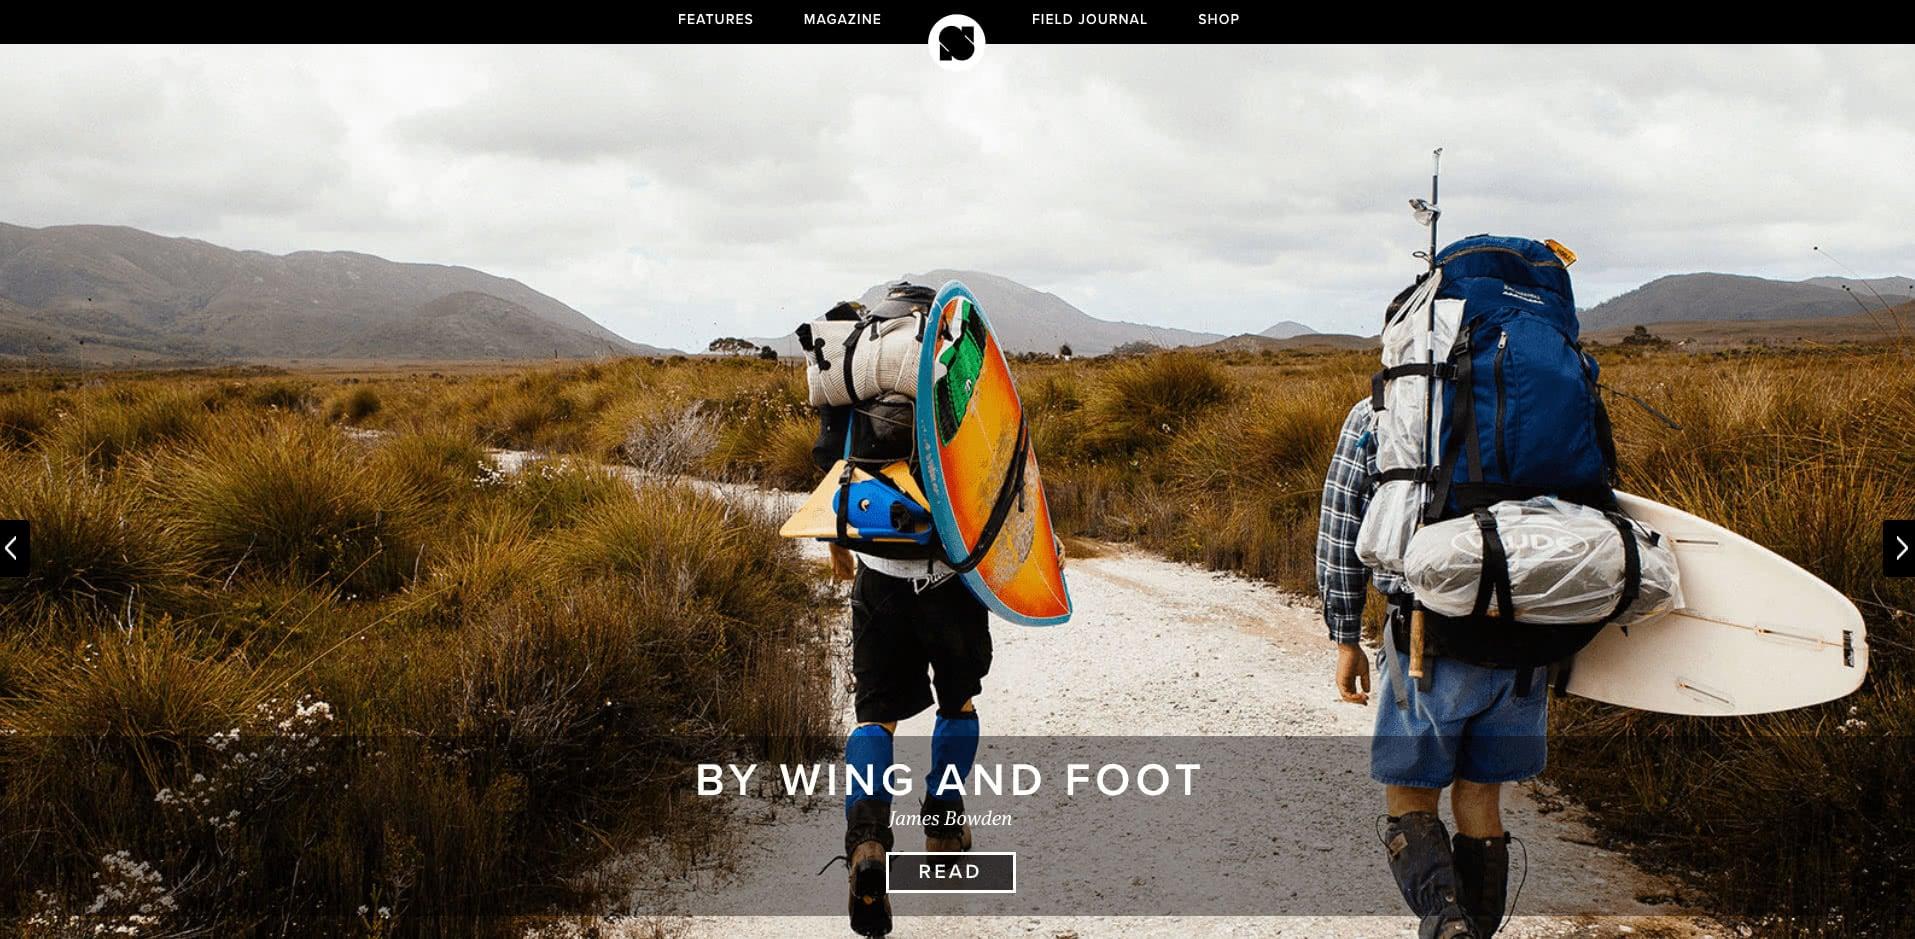 Sidetracked magazine website